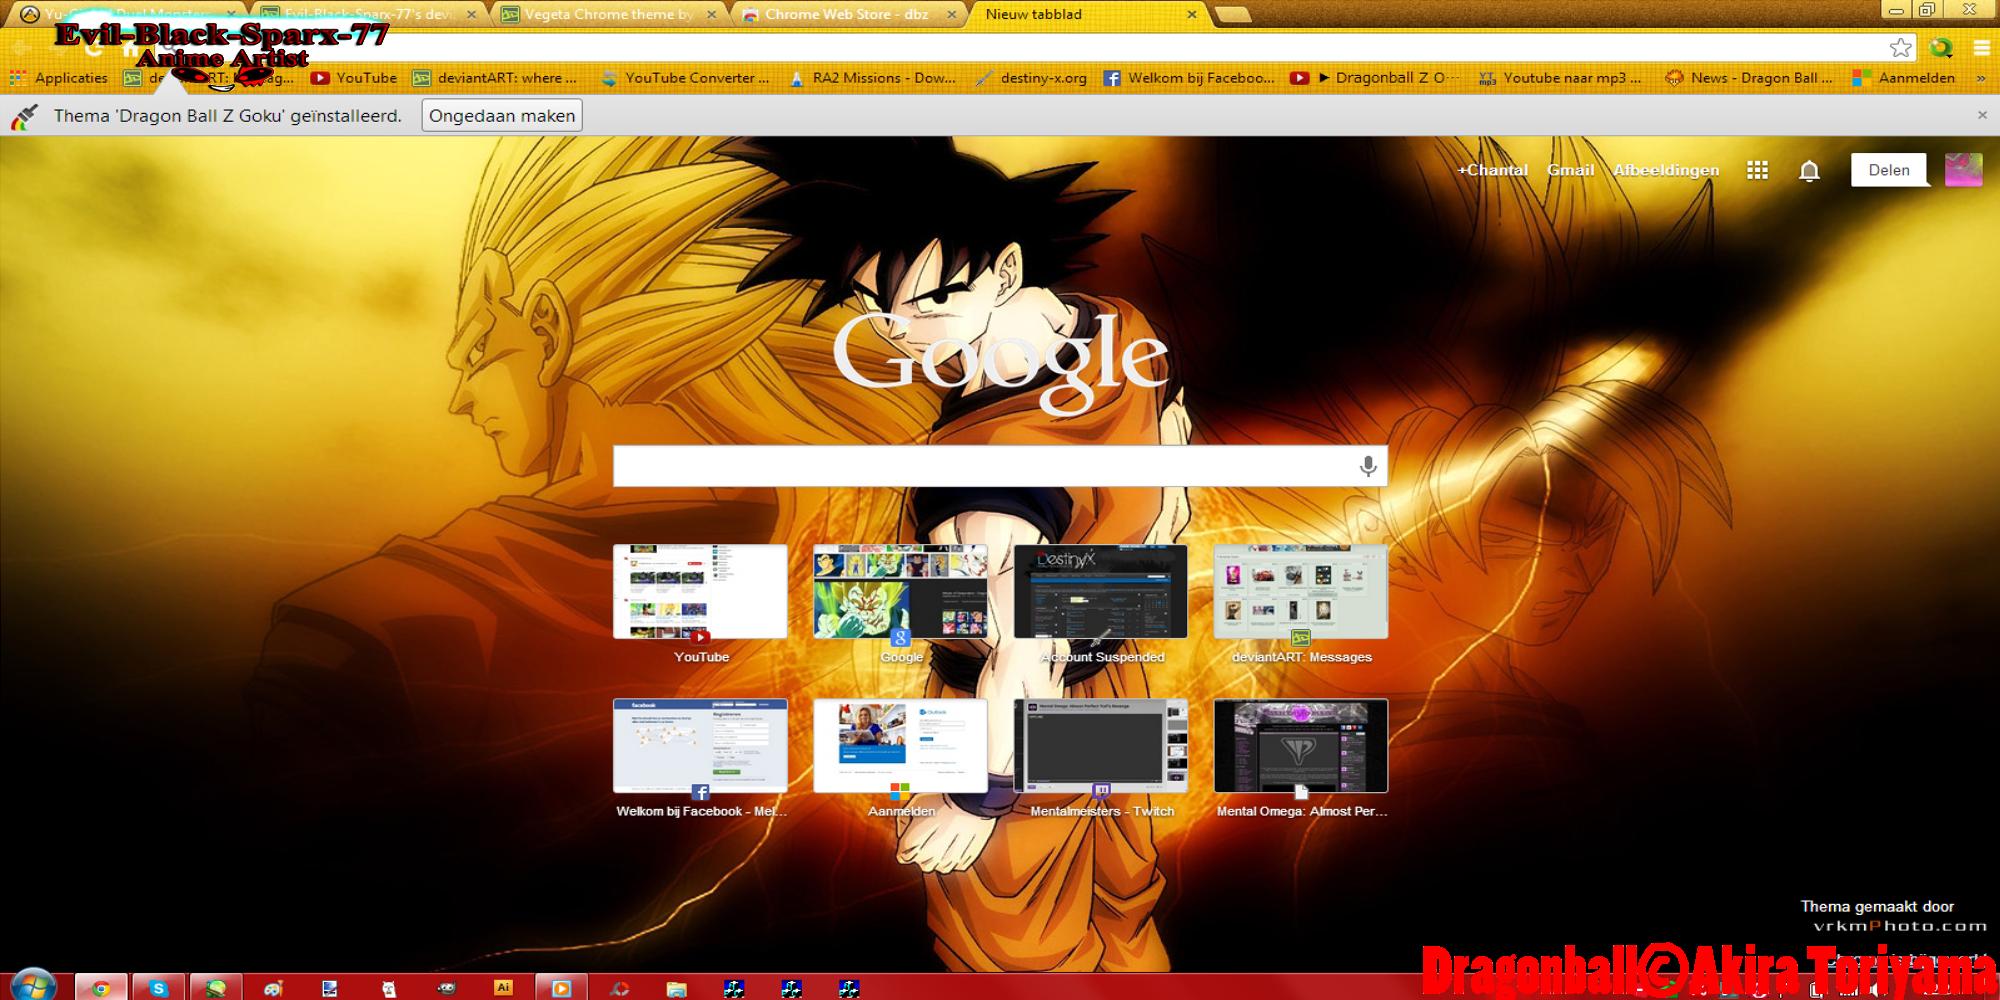 Google chrome themes dragon ball z -  Chrome Theme